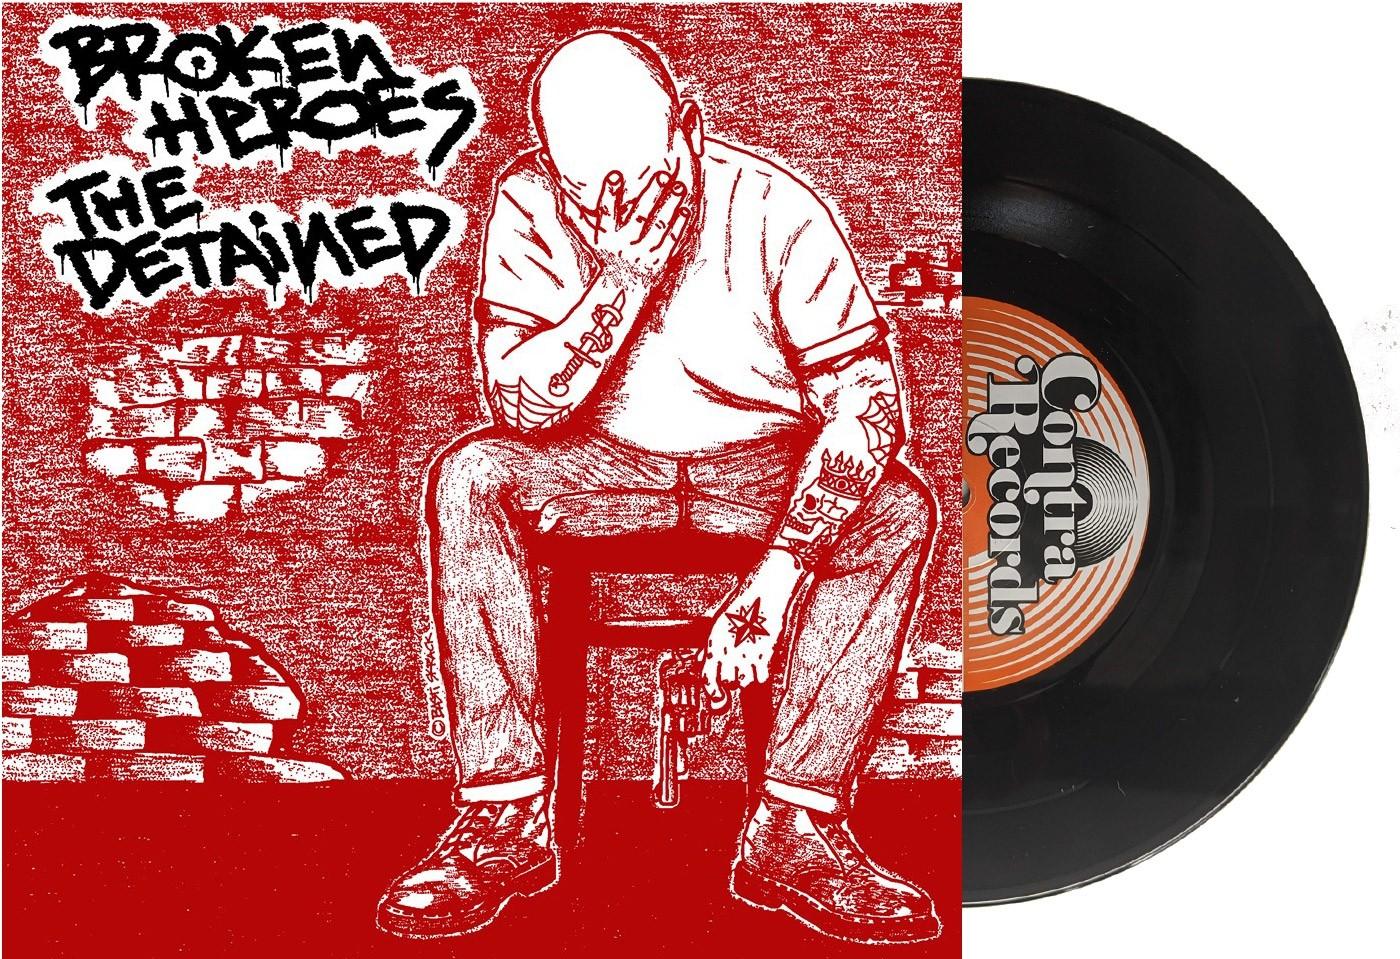 "V/A Broken Heroes / The Detained Split 7""EP lim.100 red cover/black vinyl"